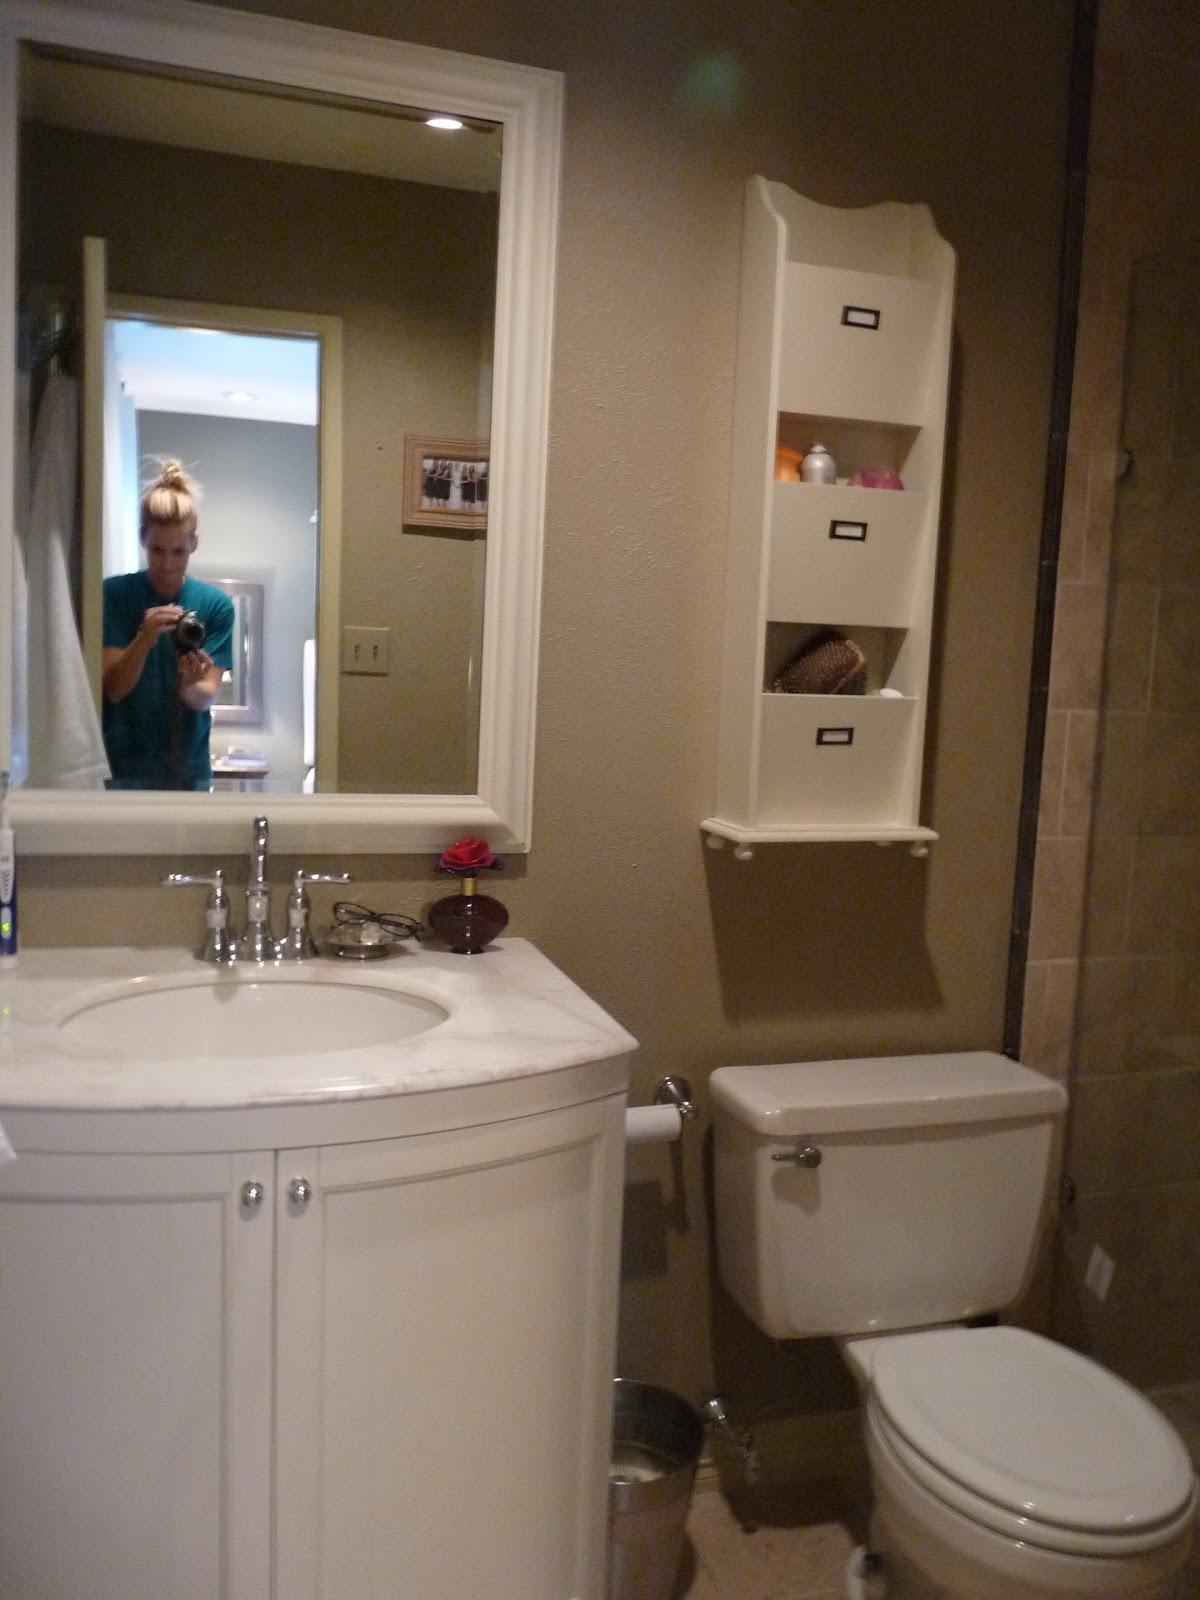 The happy homebodies new master bathroom upgrades for Bathroom upgrades